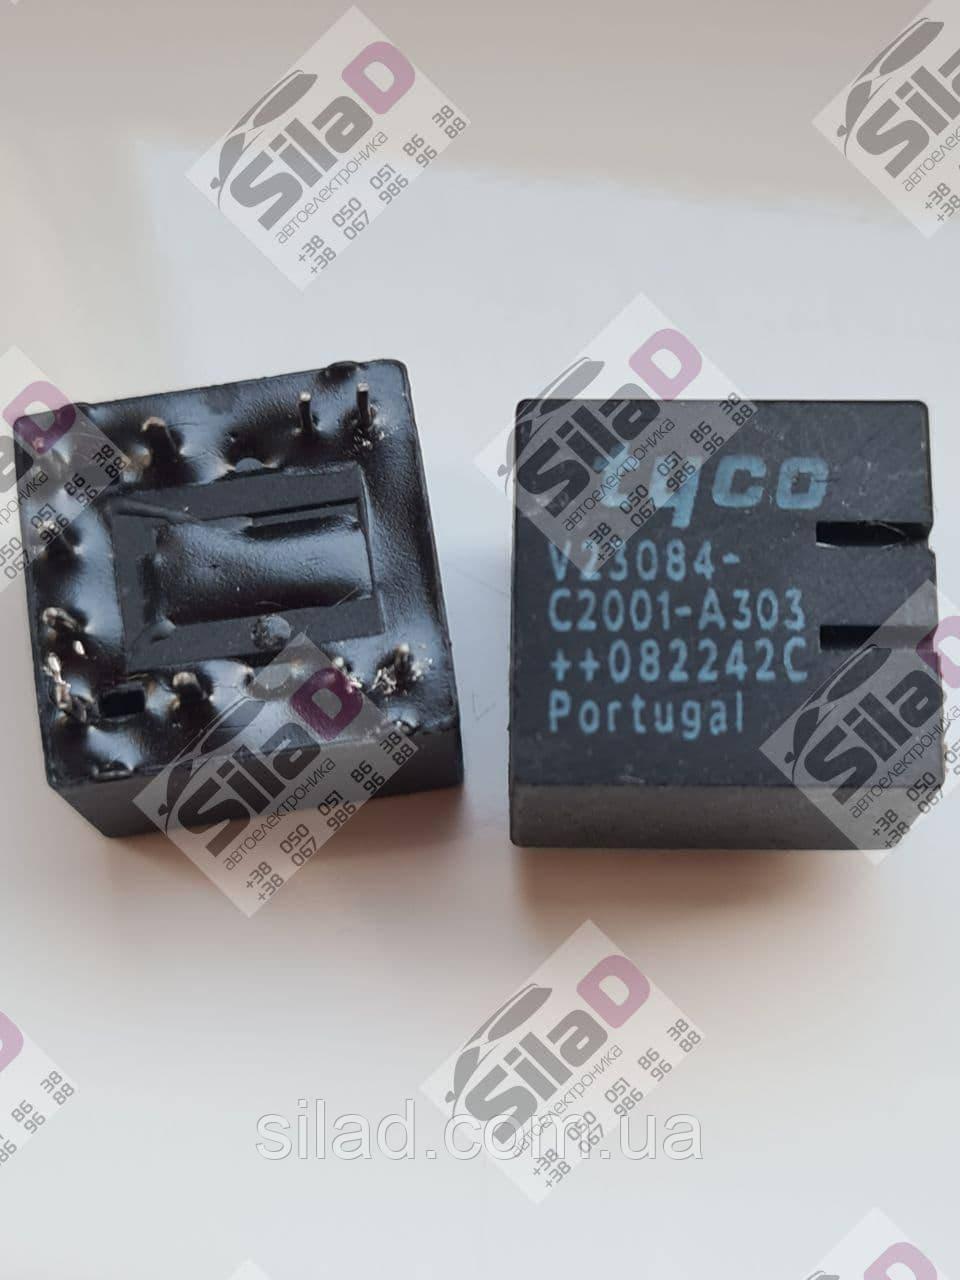 Реле Tyco V23084-C2001-A303 автомобильное реле  DIP10